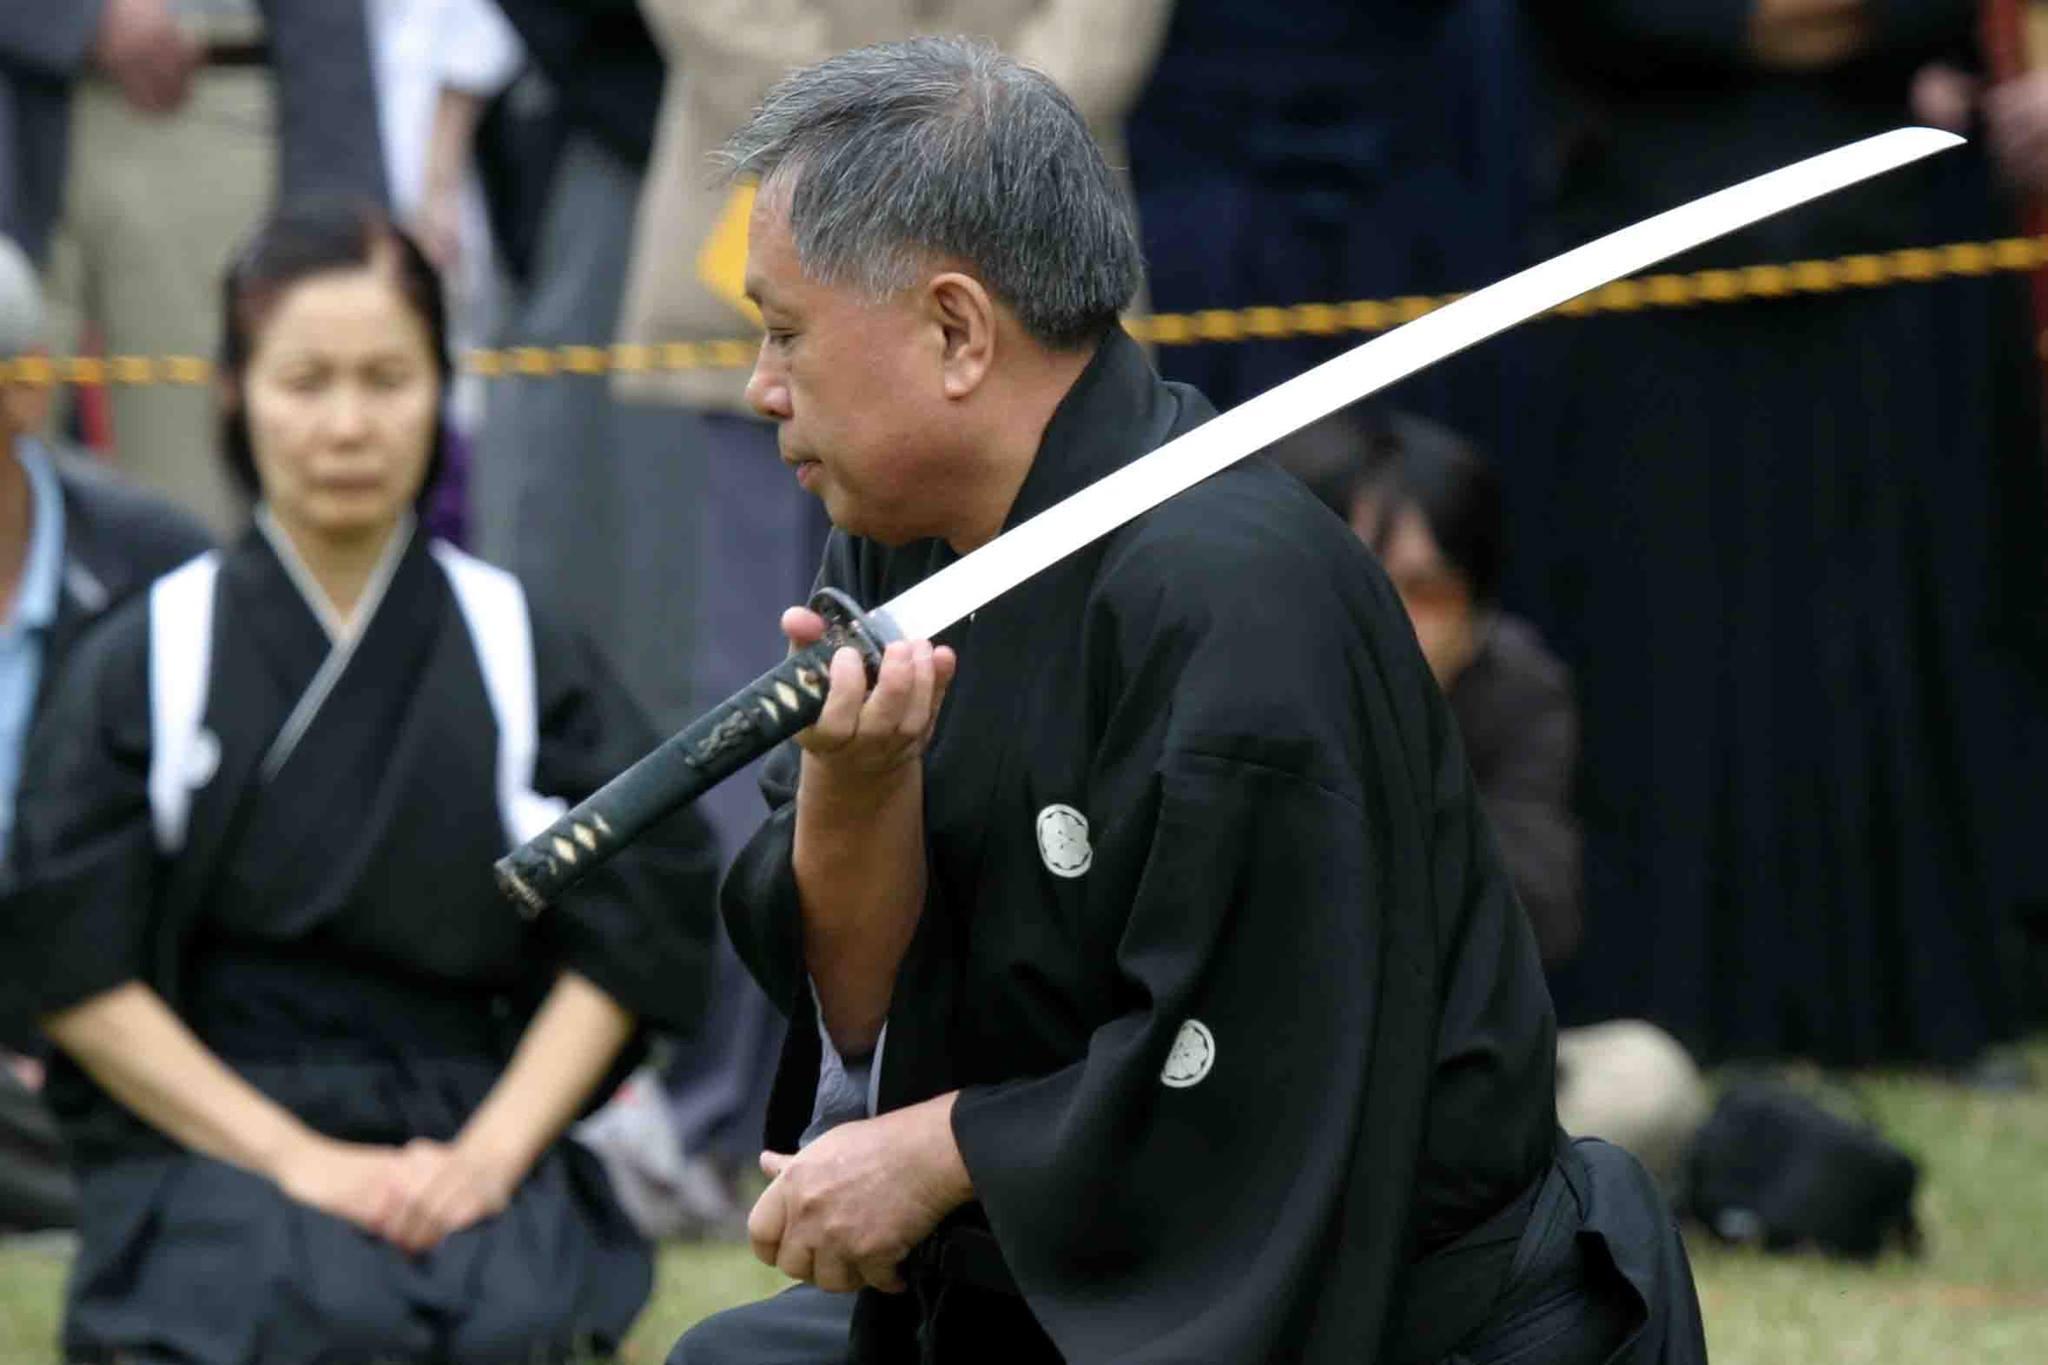 sugino yukihiro Katori Shinto Ryu Seminar with Sugino Sensei 9'dan in Leer